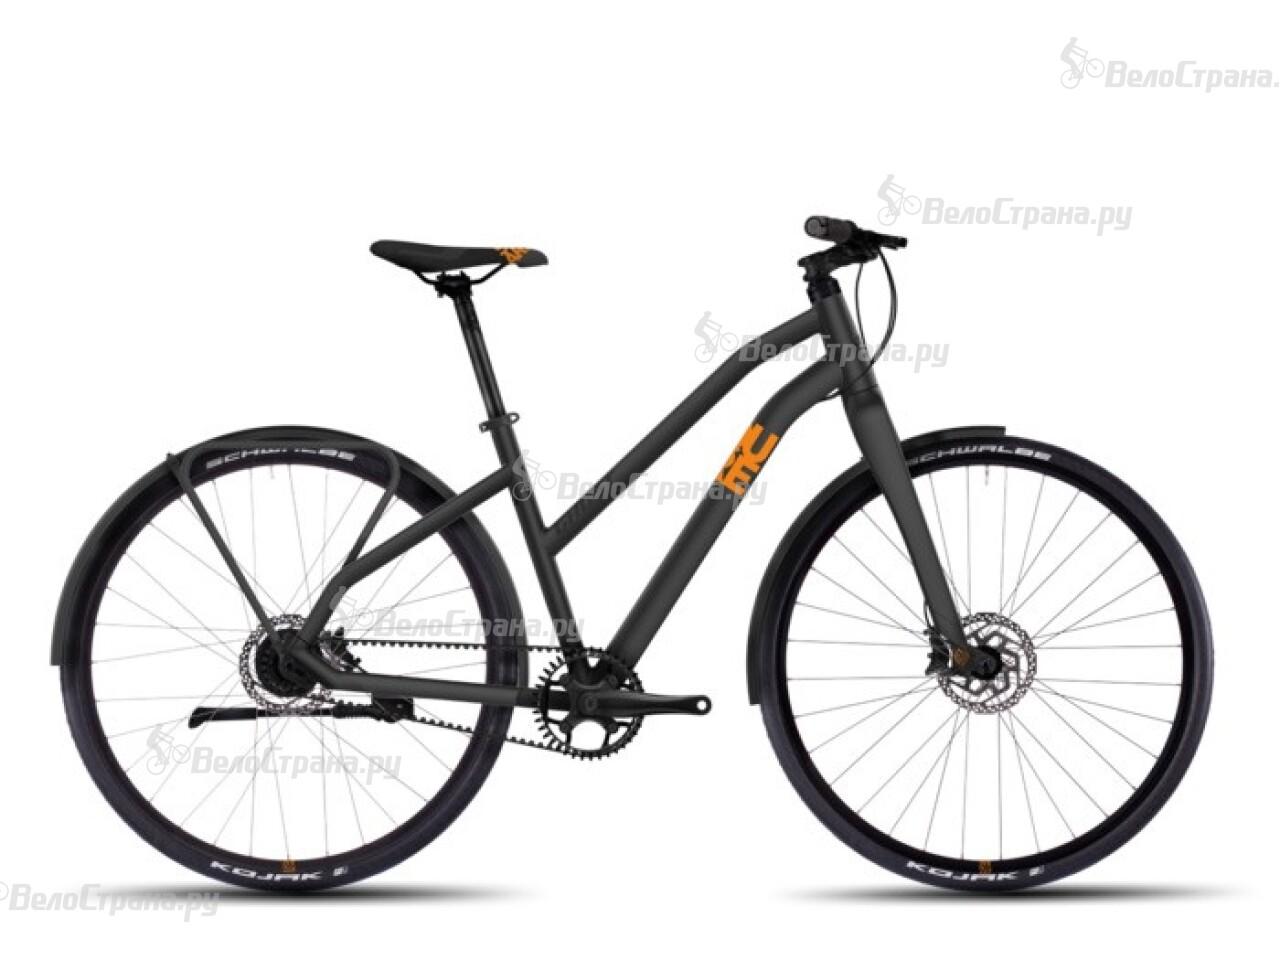 Велосипед Ghost SQUARE Urban 6 Miss (2016) цены онлайн